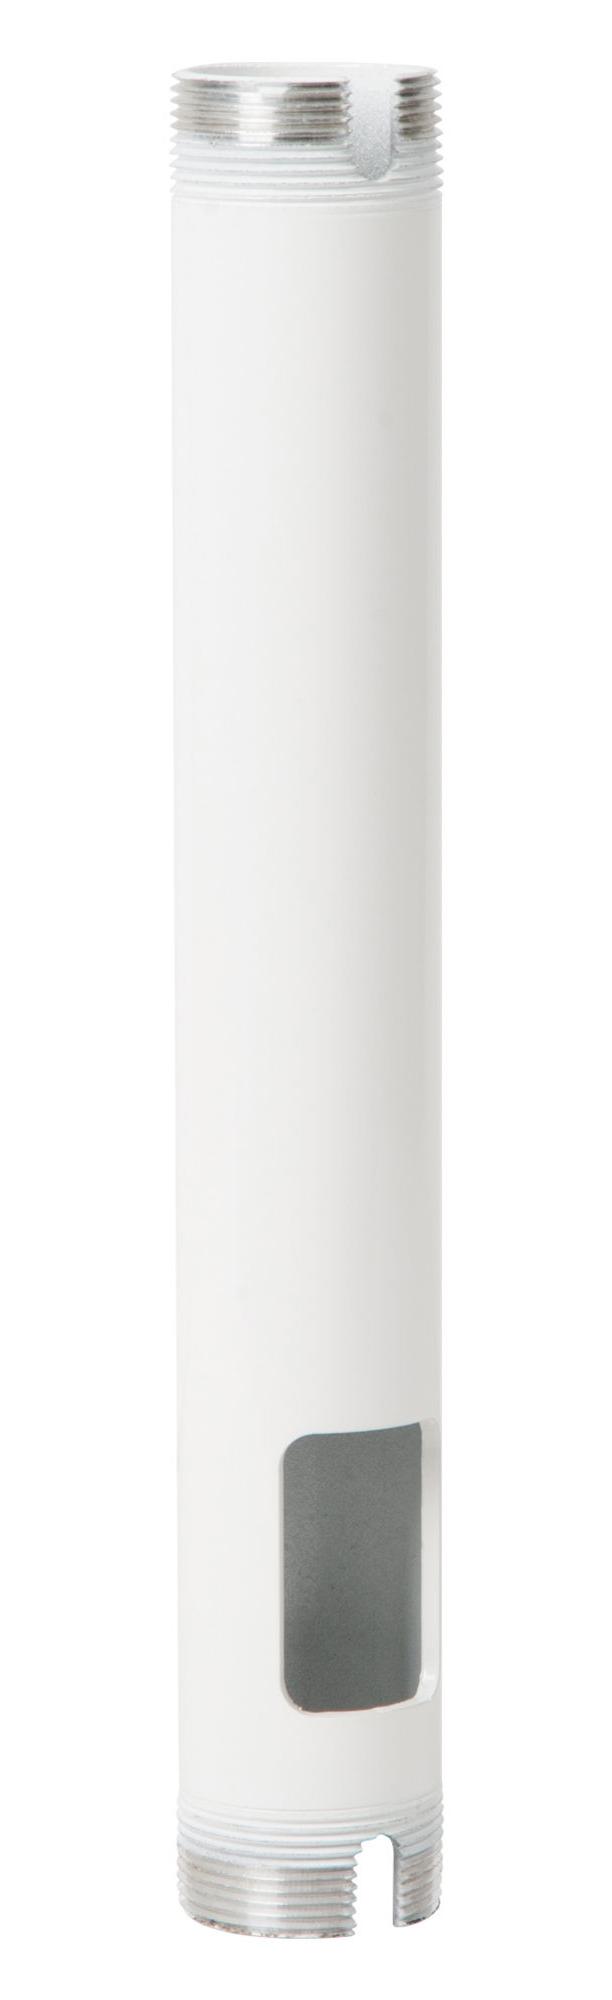 Peerless EXT102-W 2 ft Fixed Extension Column, White EXT102-W